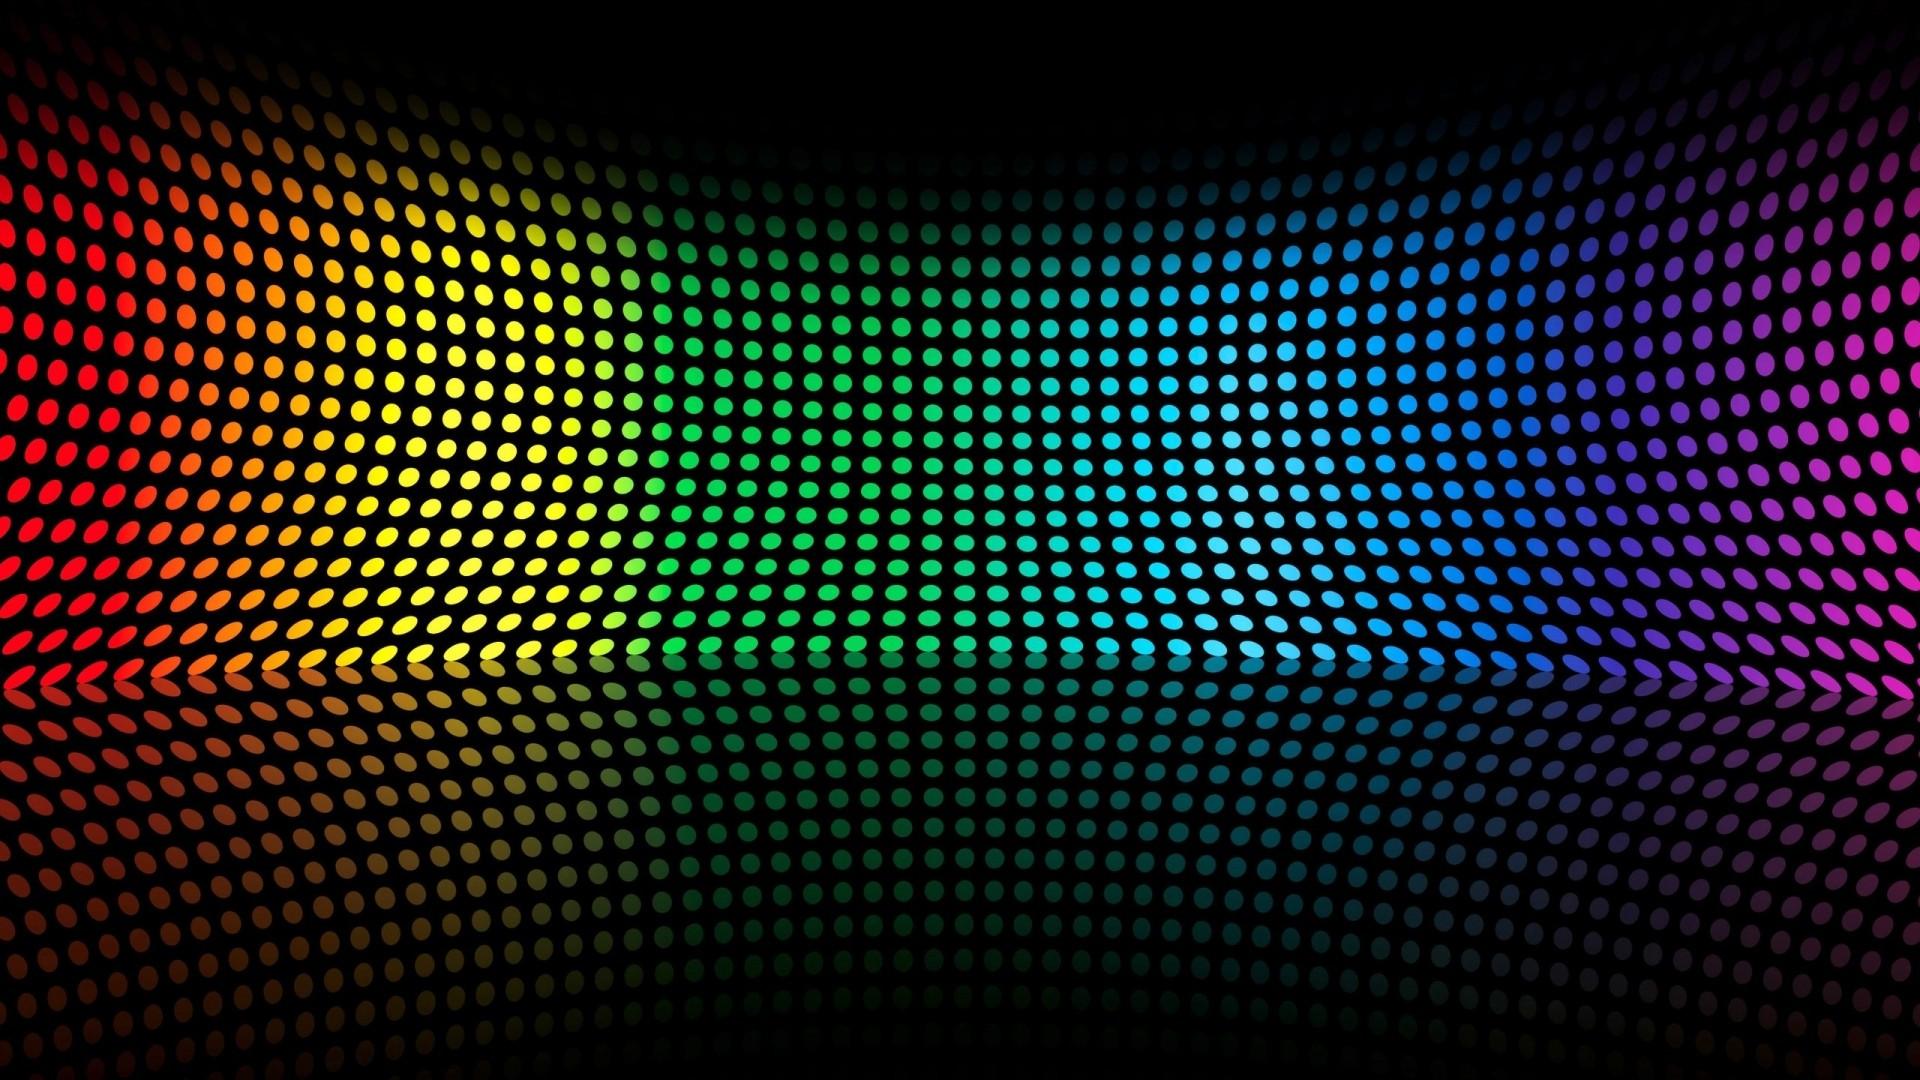 Ultra 4K HD Lenovo Wallpaper 45 images 1920x1080